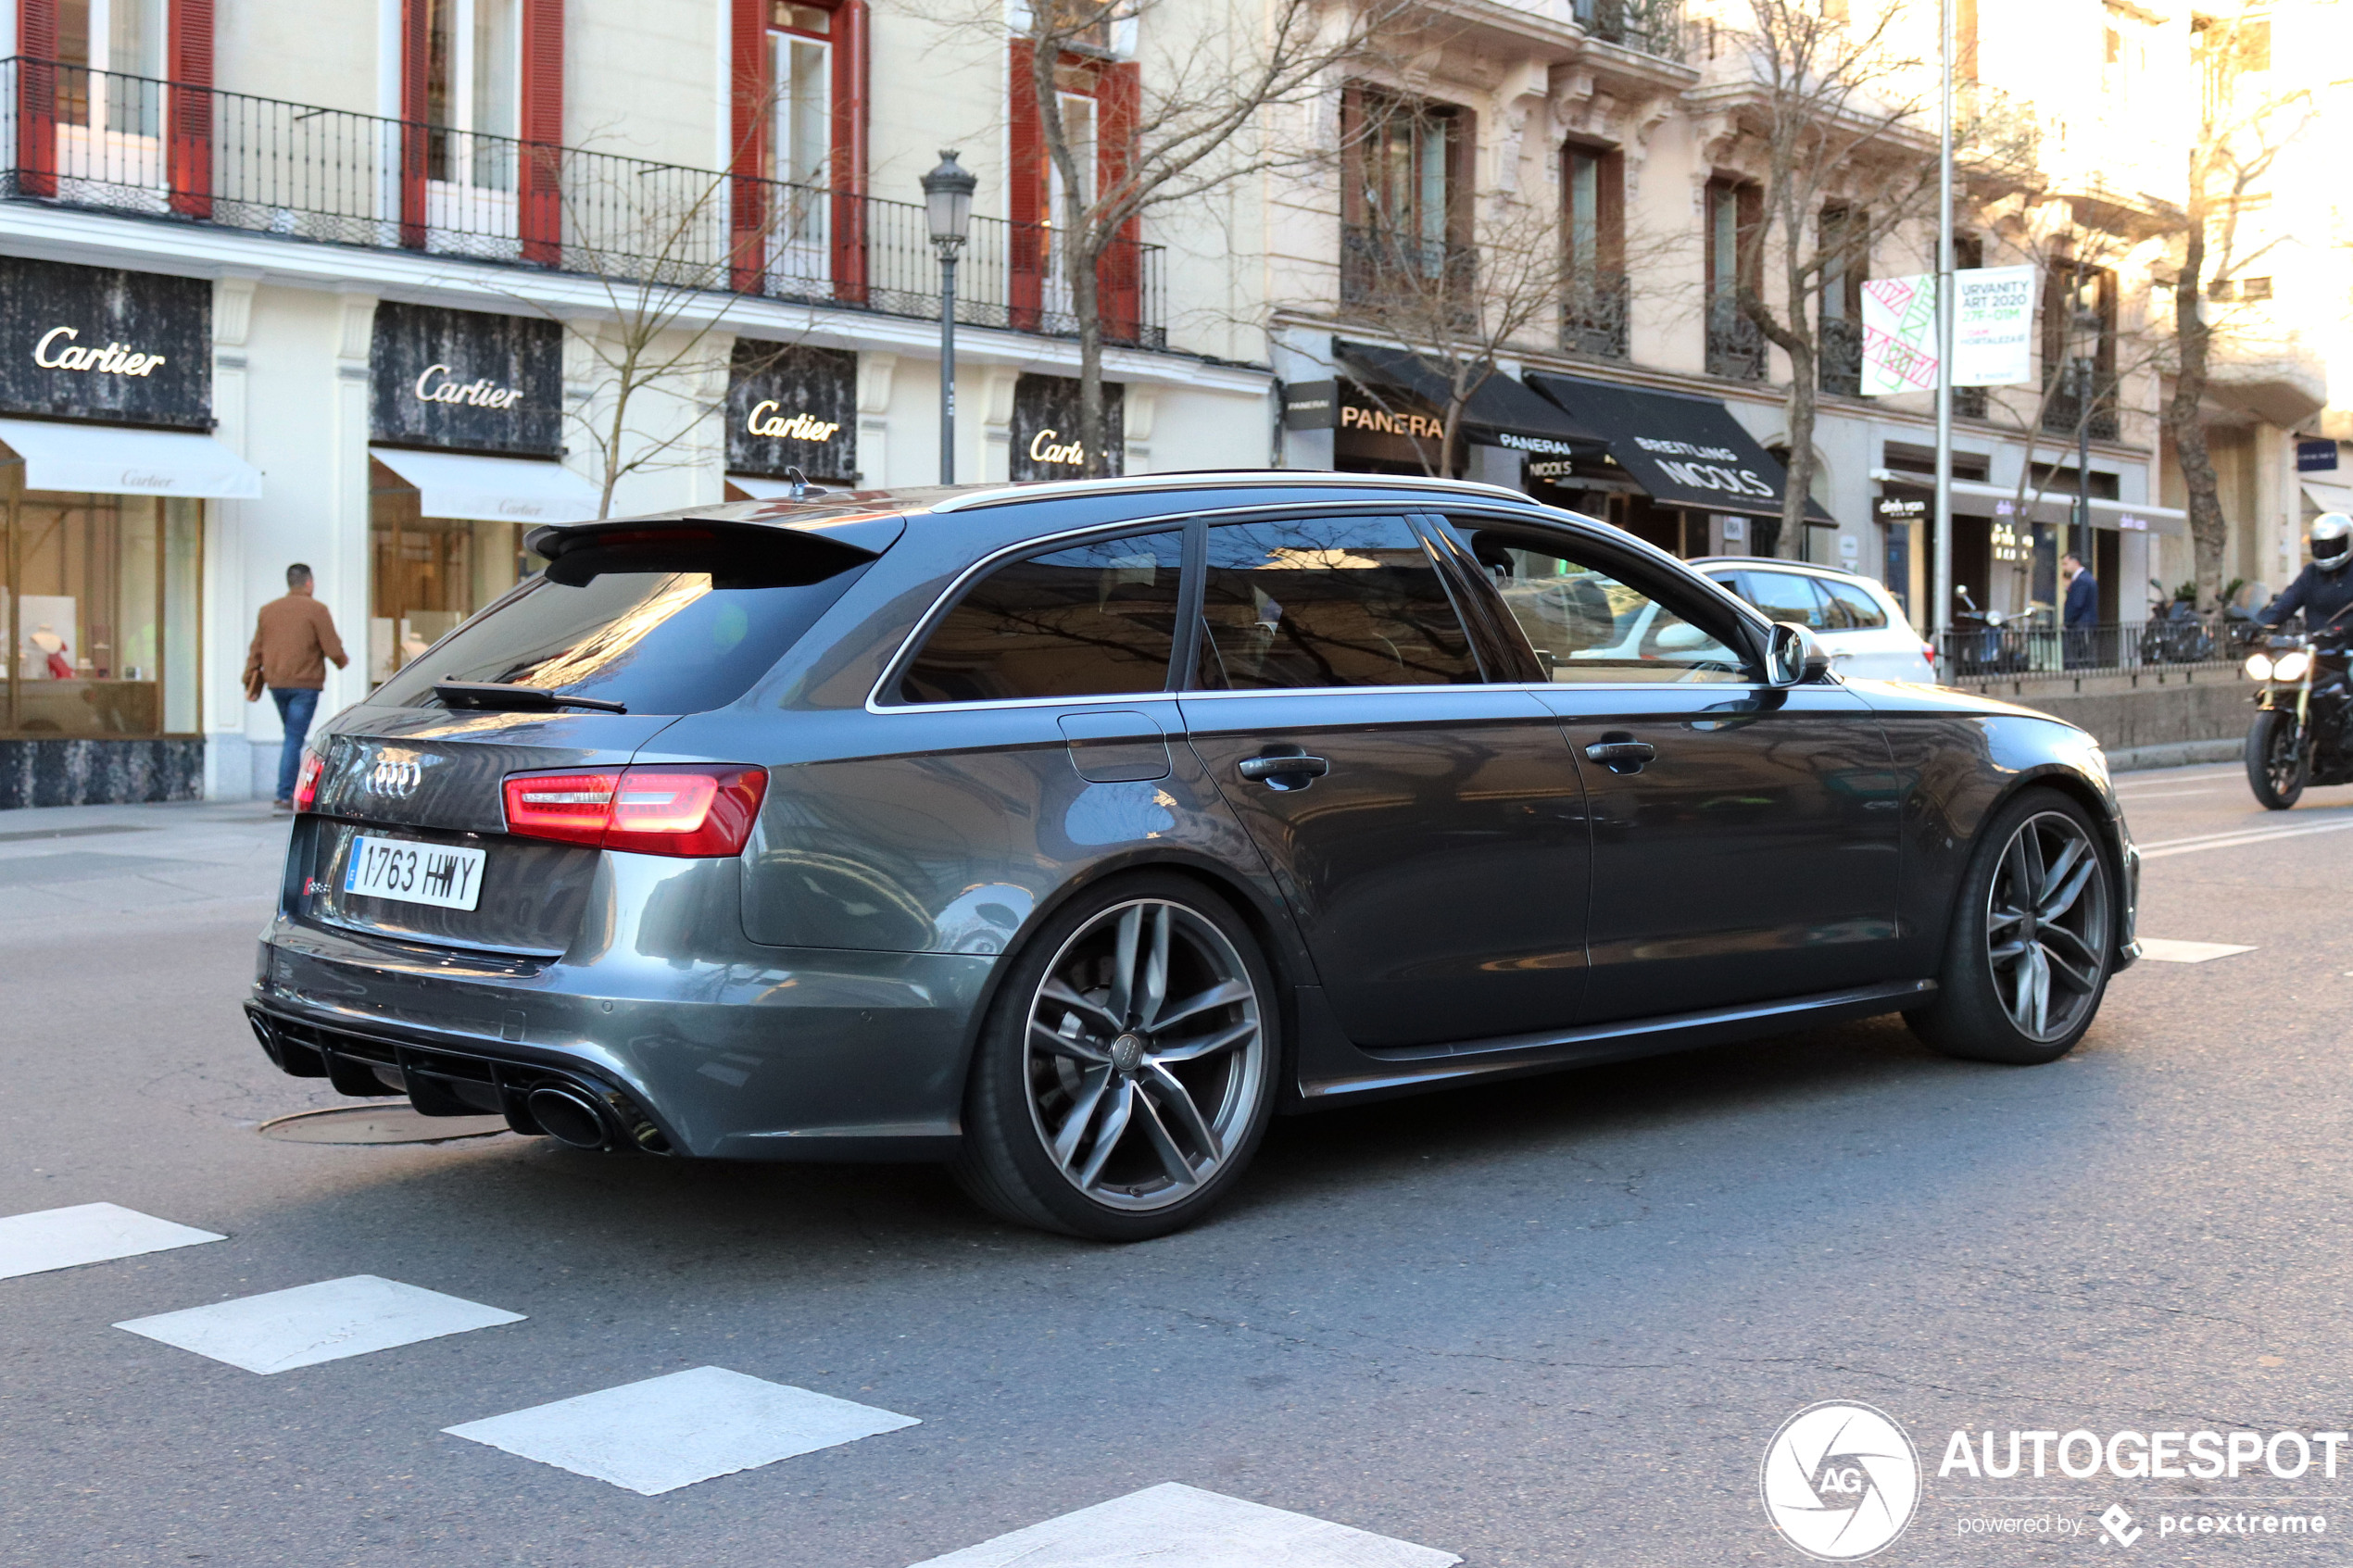 Audi RS6 Avant C7 - 24 februari 2020 - Autogespot